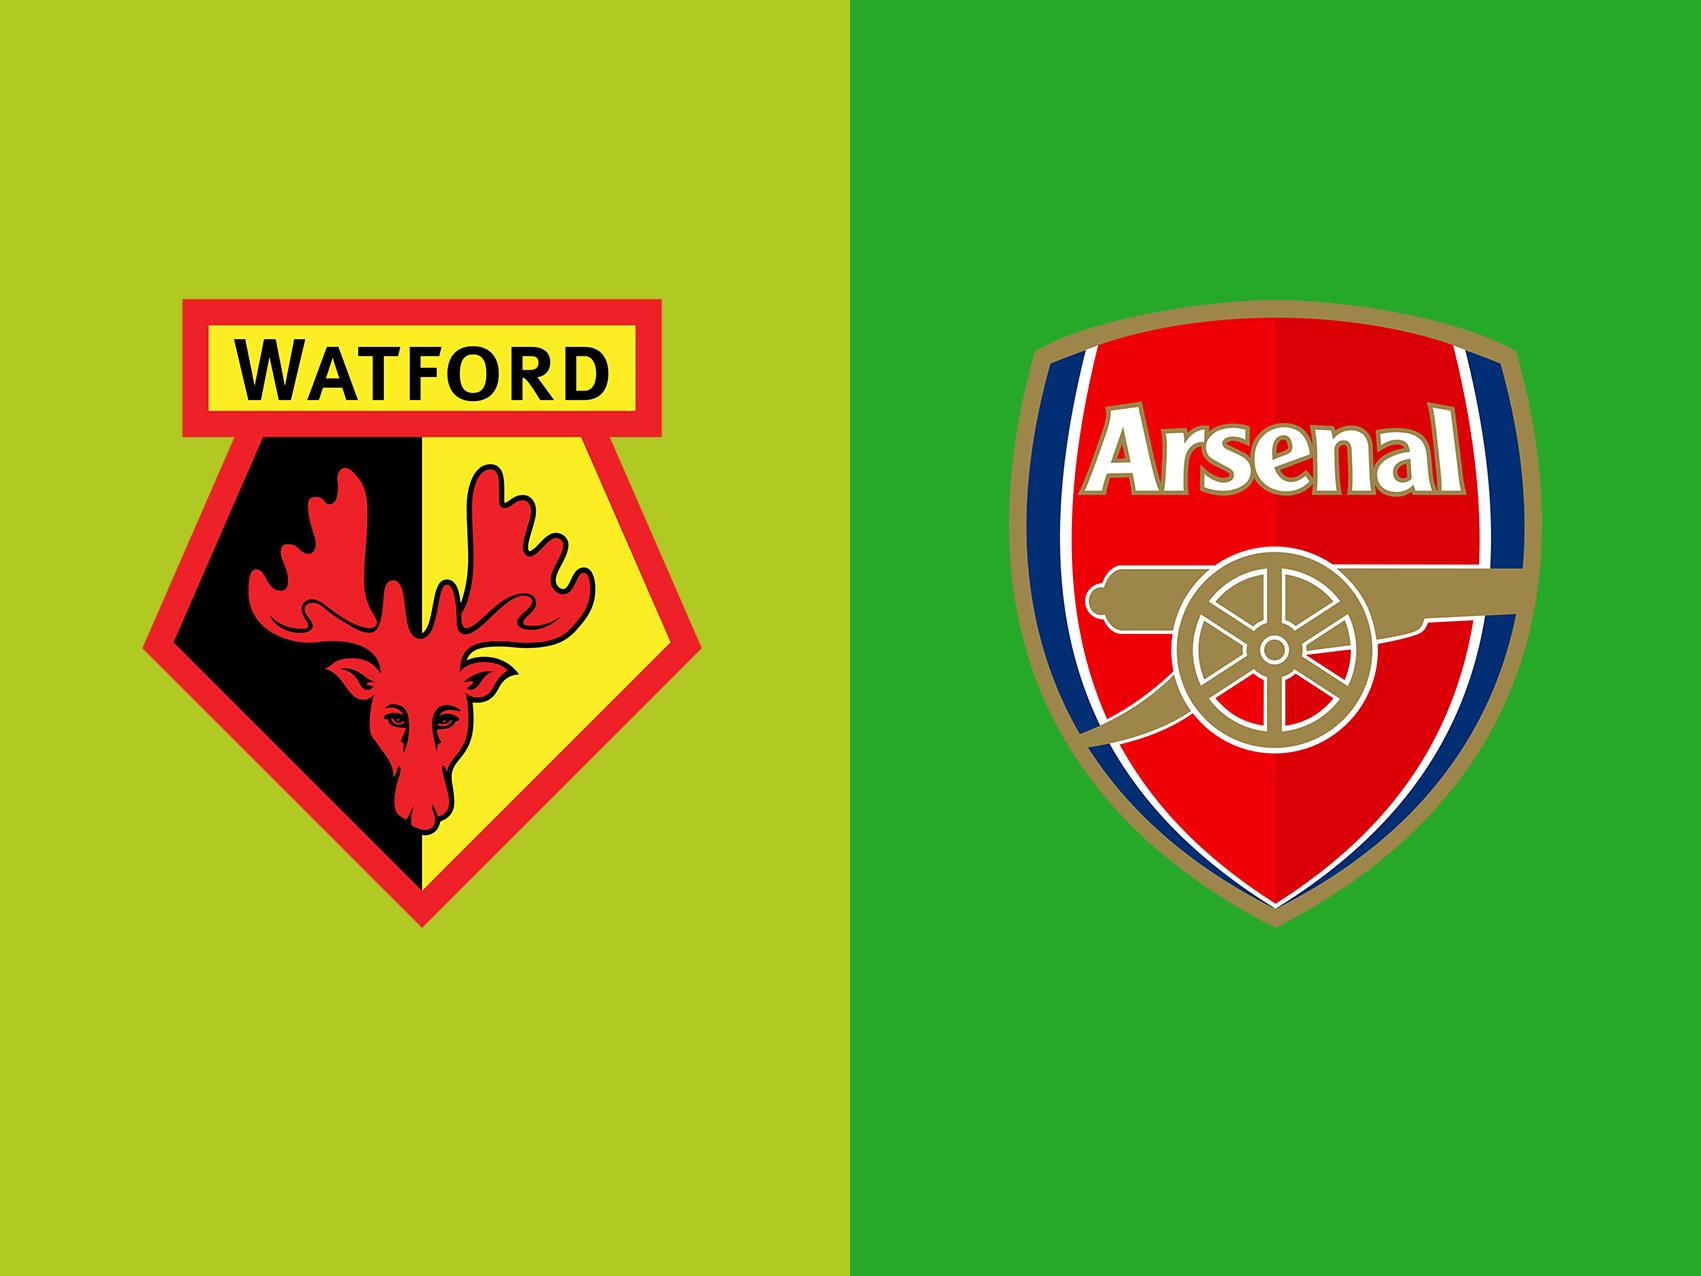 soi-keo-ca-cuoc-bong-da-ngay-16-4-slavia-praha-vs-Arsenal-cong-pha-phao-dai-b9 1